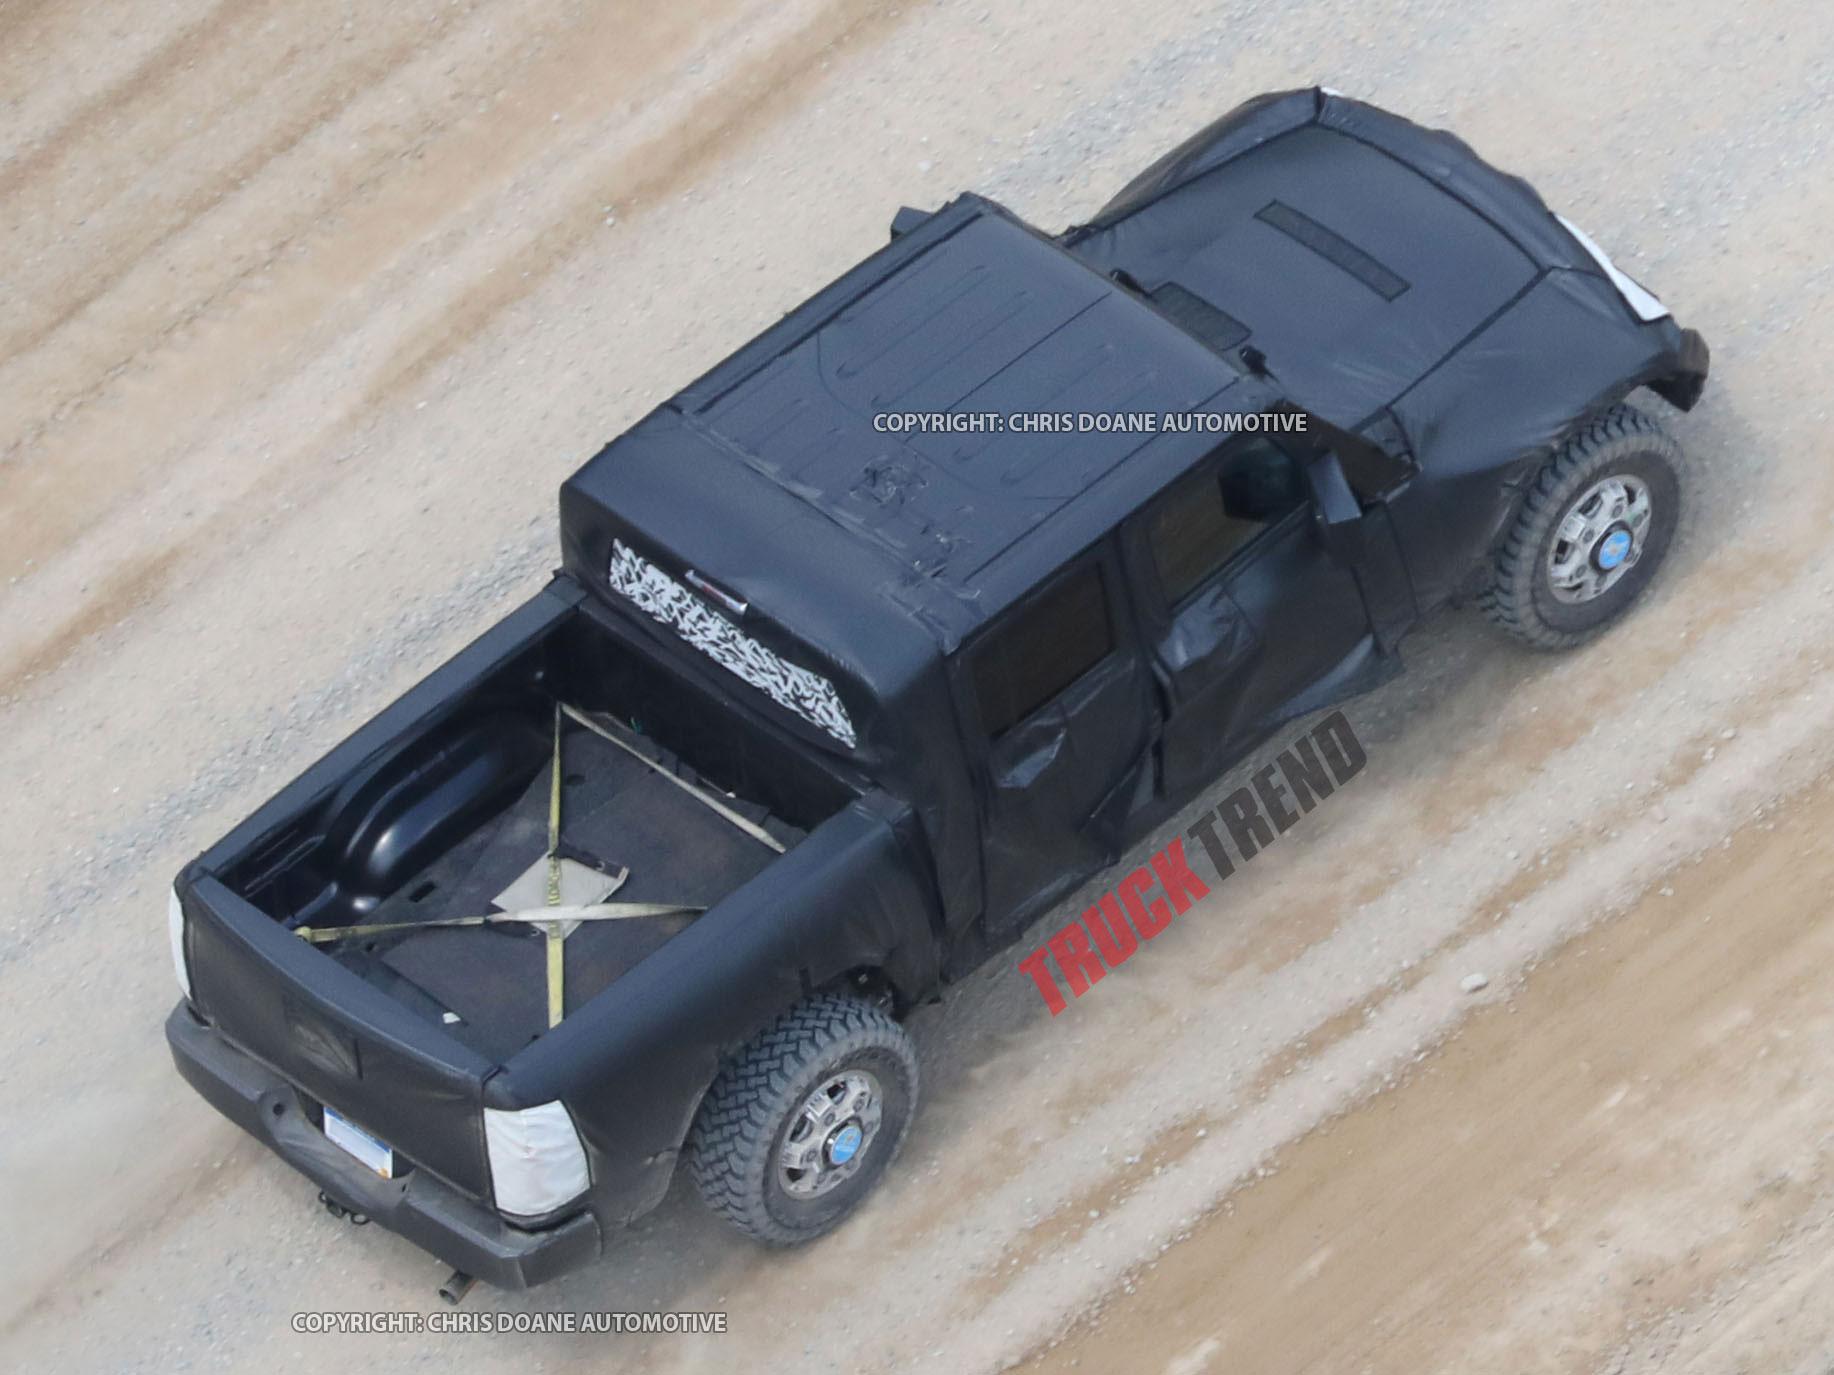 2019 Jeep Wrangler JL Pickup Spyshots 11